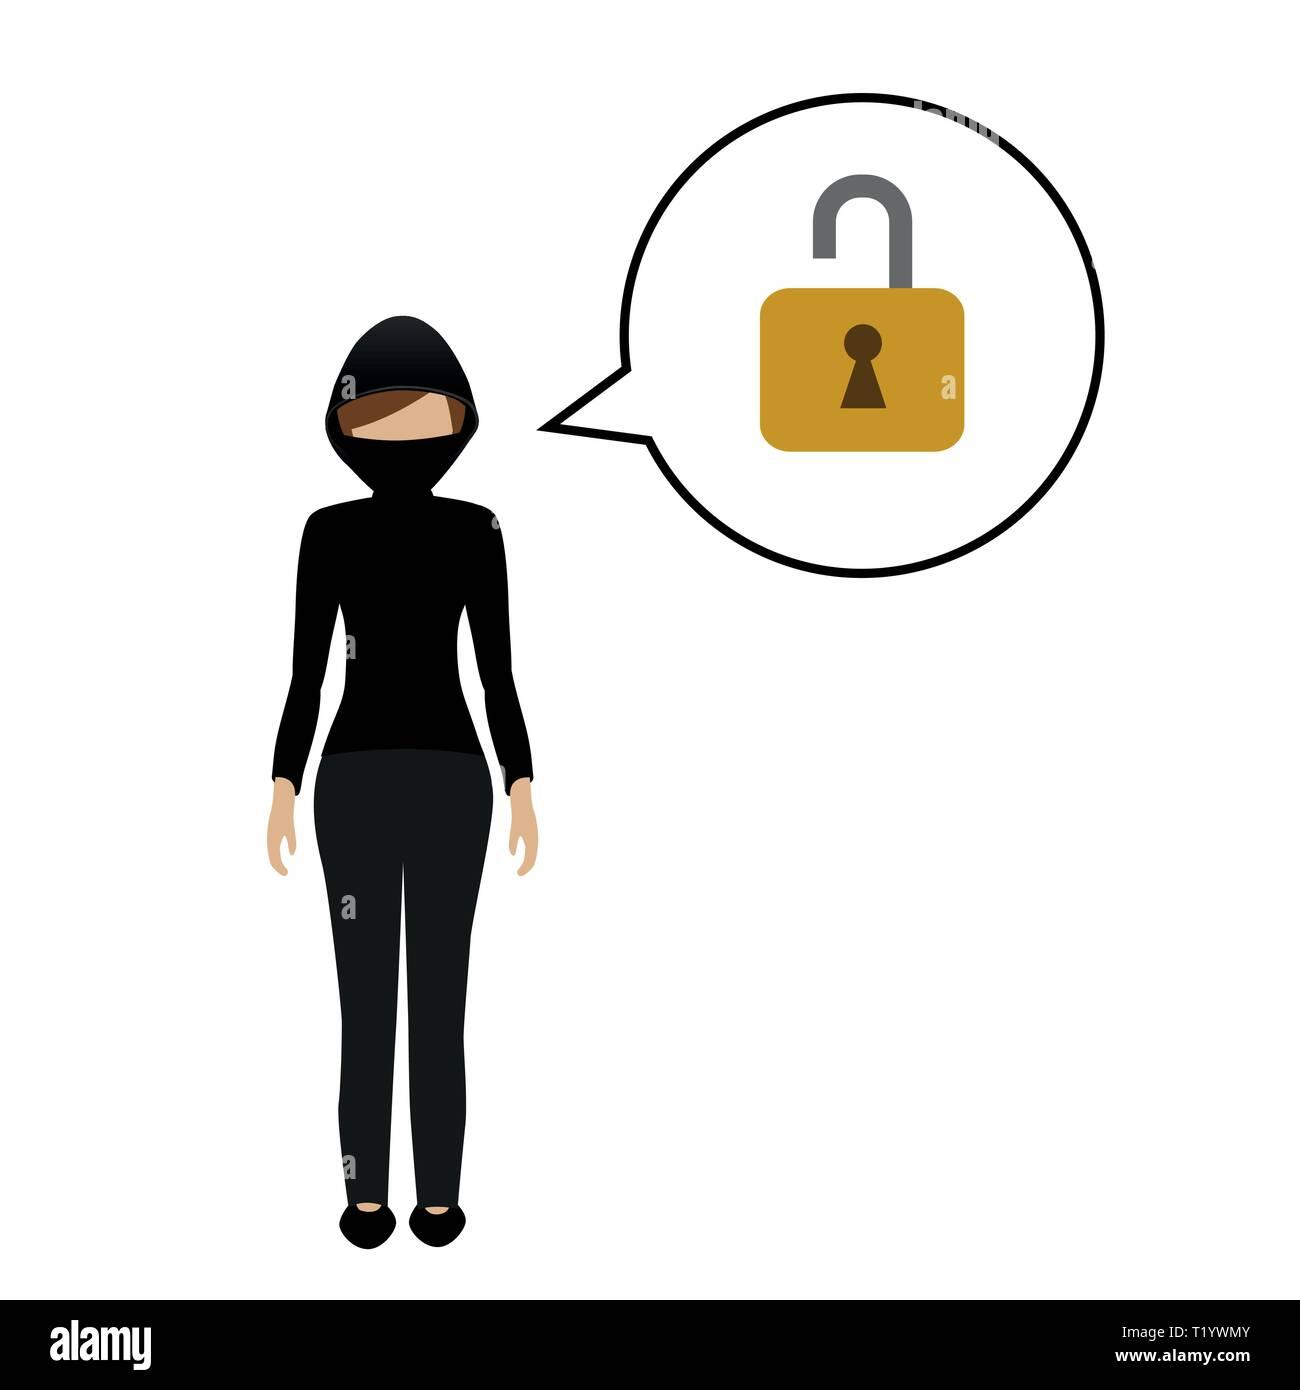 female burglar character talks about opening a lock vector illustration EPS10 - Stock Vector